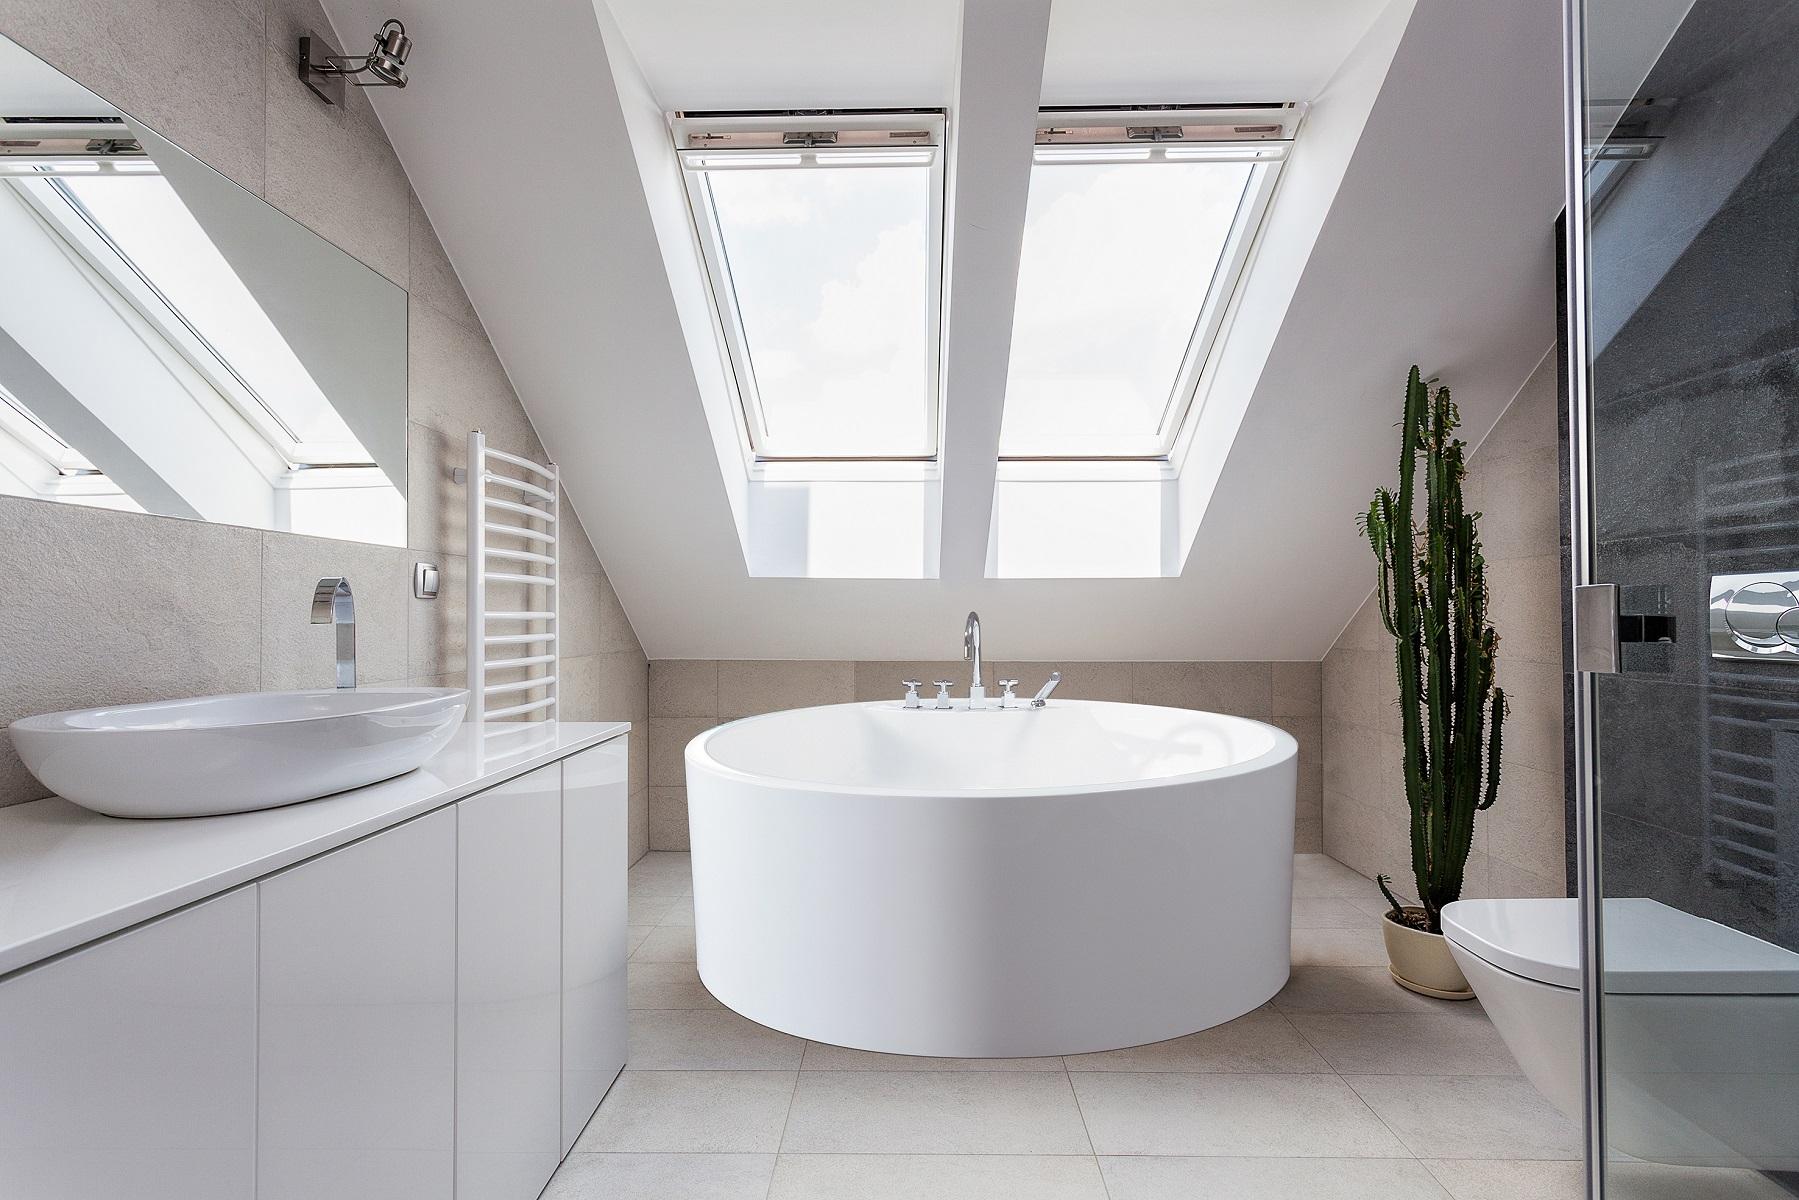 Vasca Da Bagno Freestanding Rotonda : Purescape™ a la vasca da bagno freestanding aquatica in